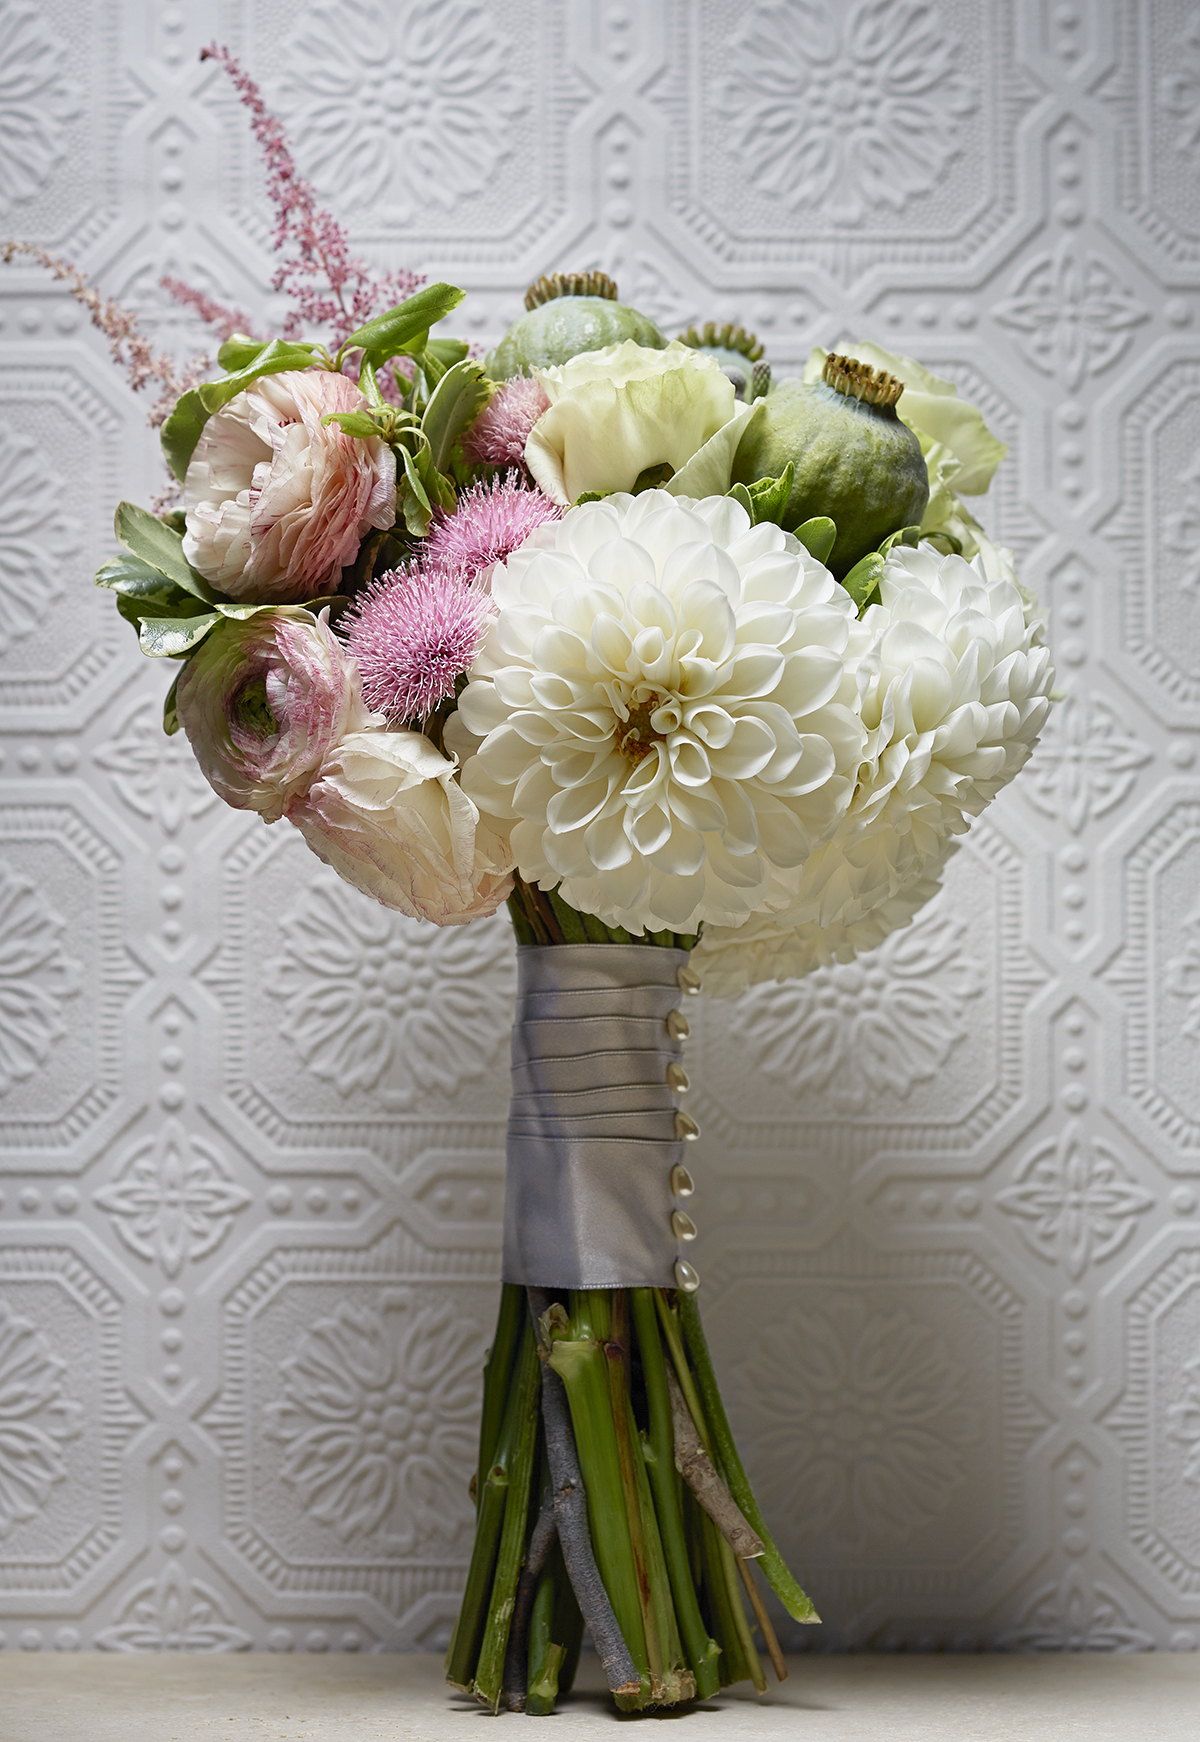 """Toronto's Best Wedding Florists.""  Weddingful Blog,  August 5, 2014."